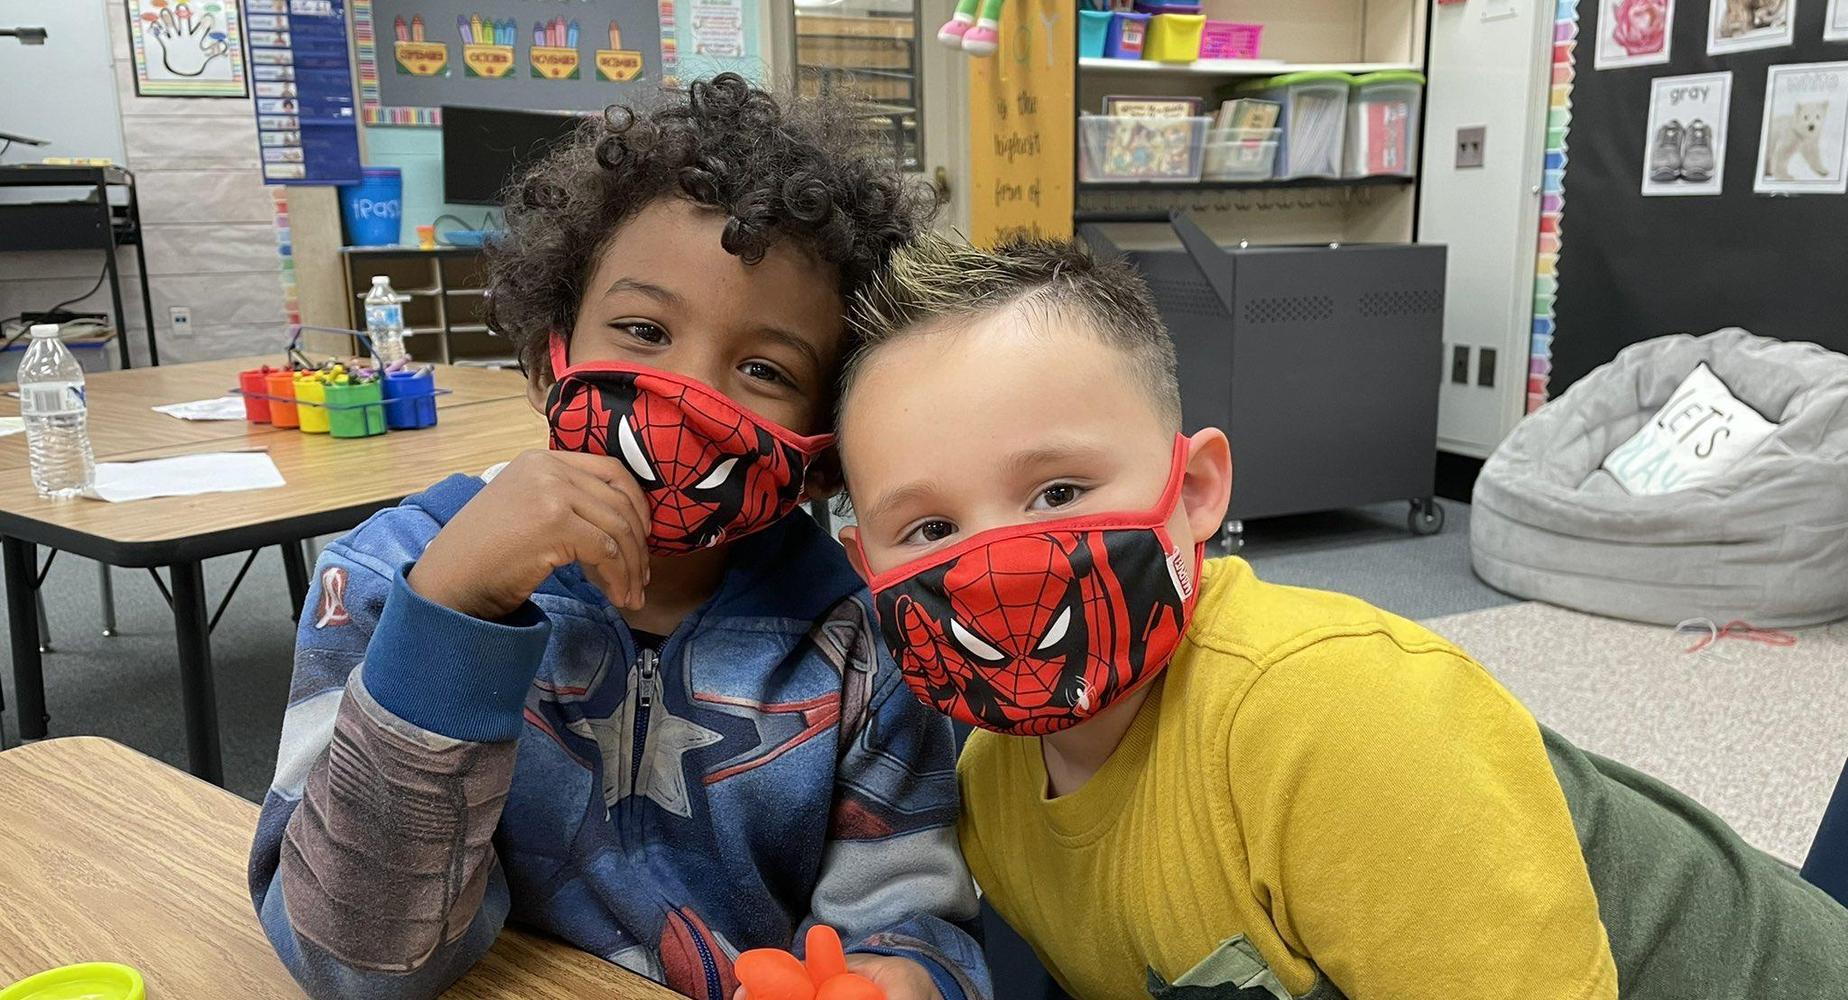 Matching masks!